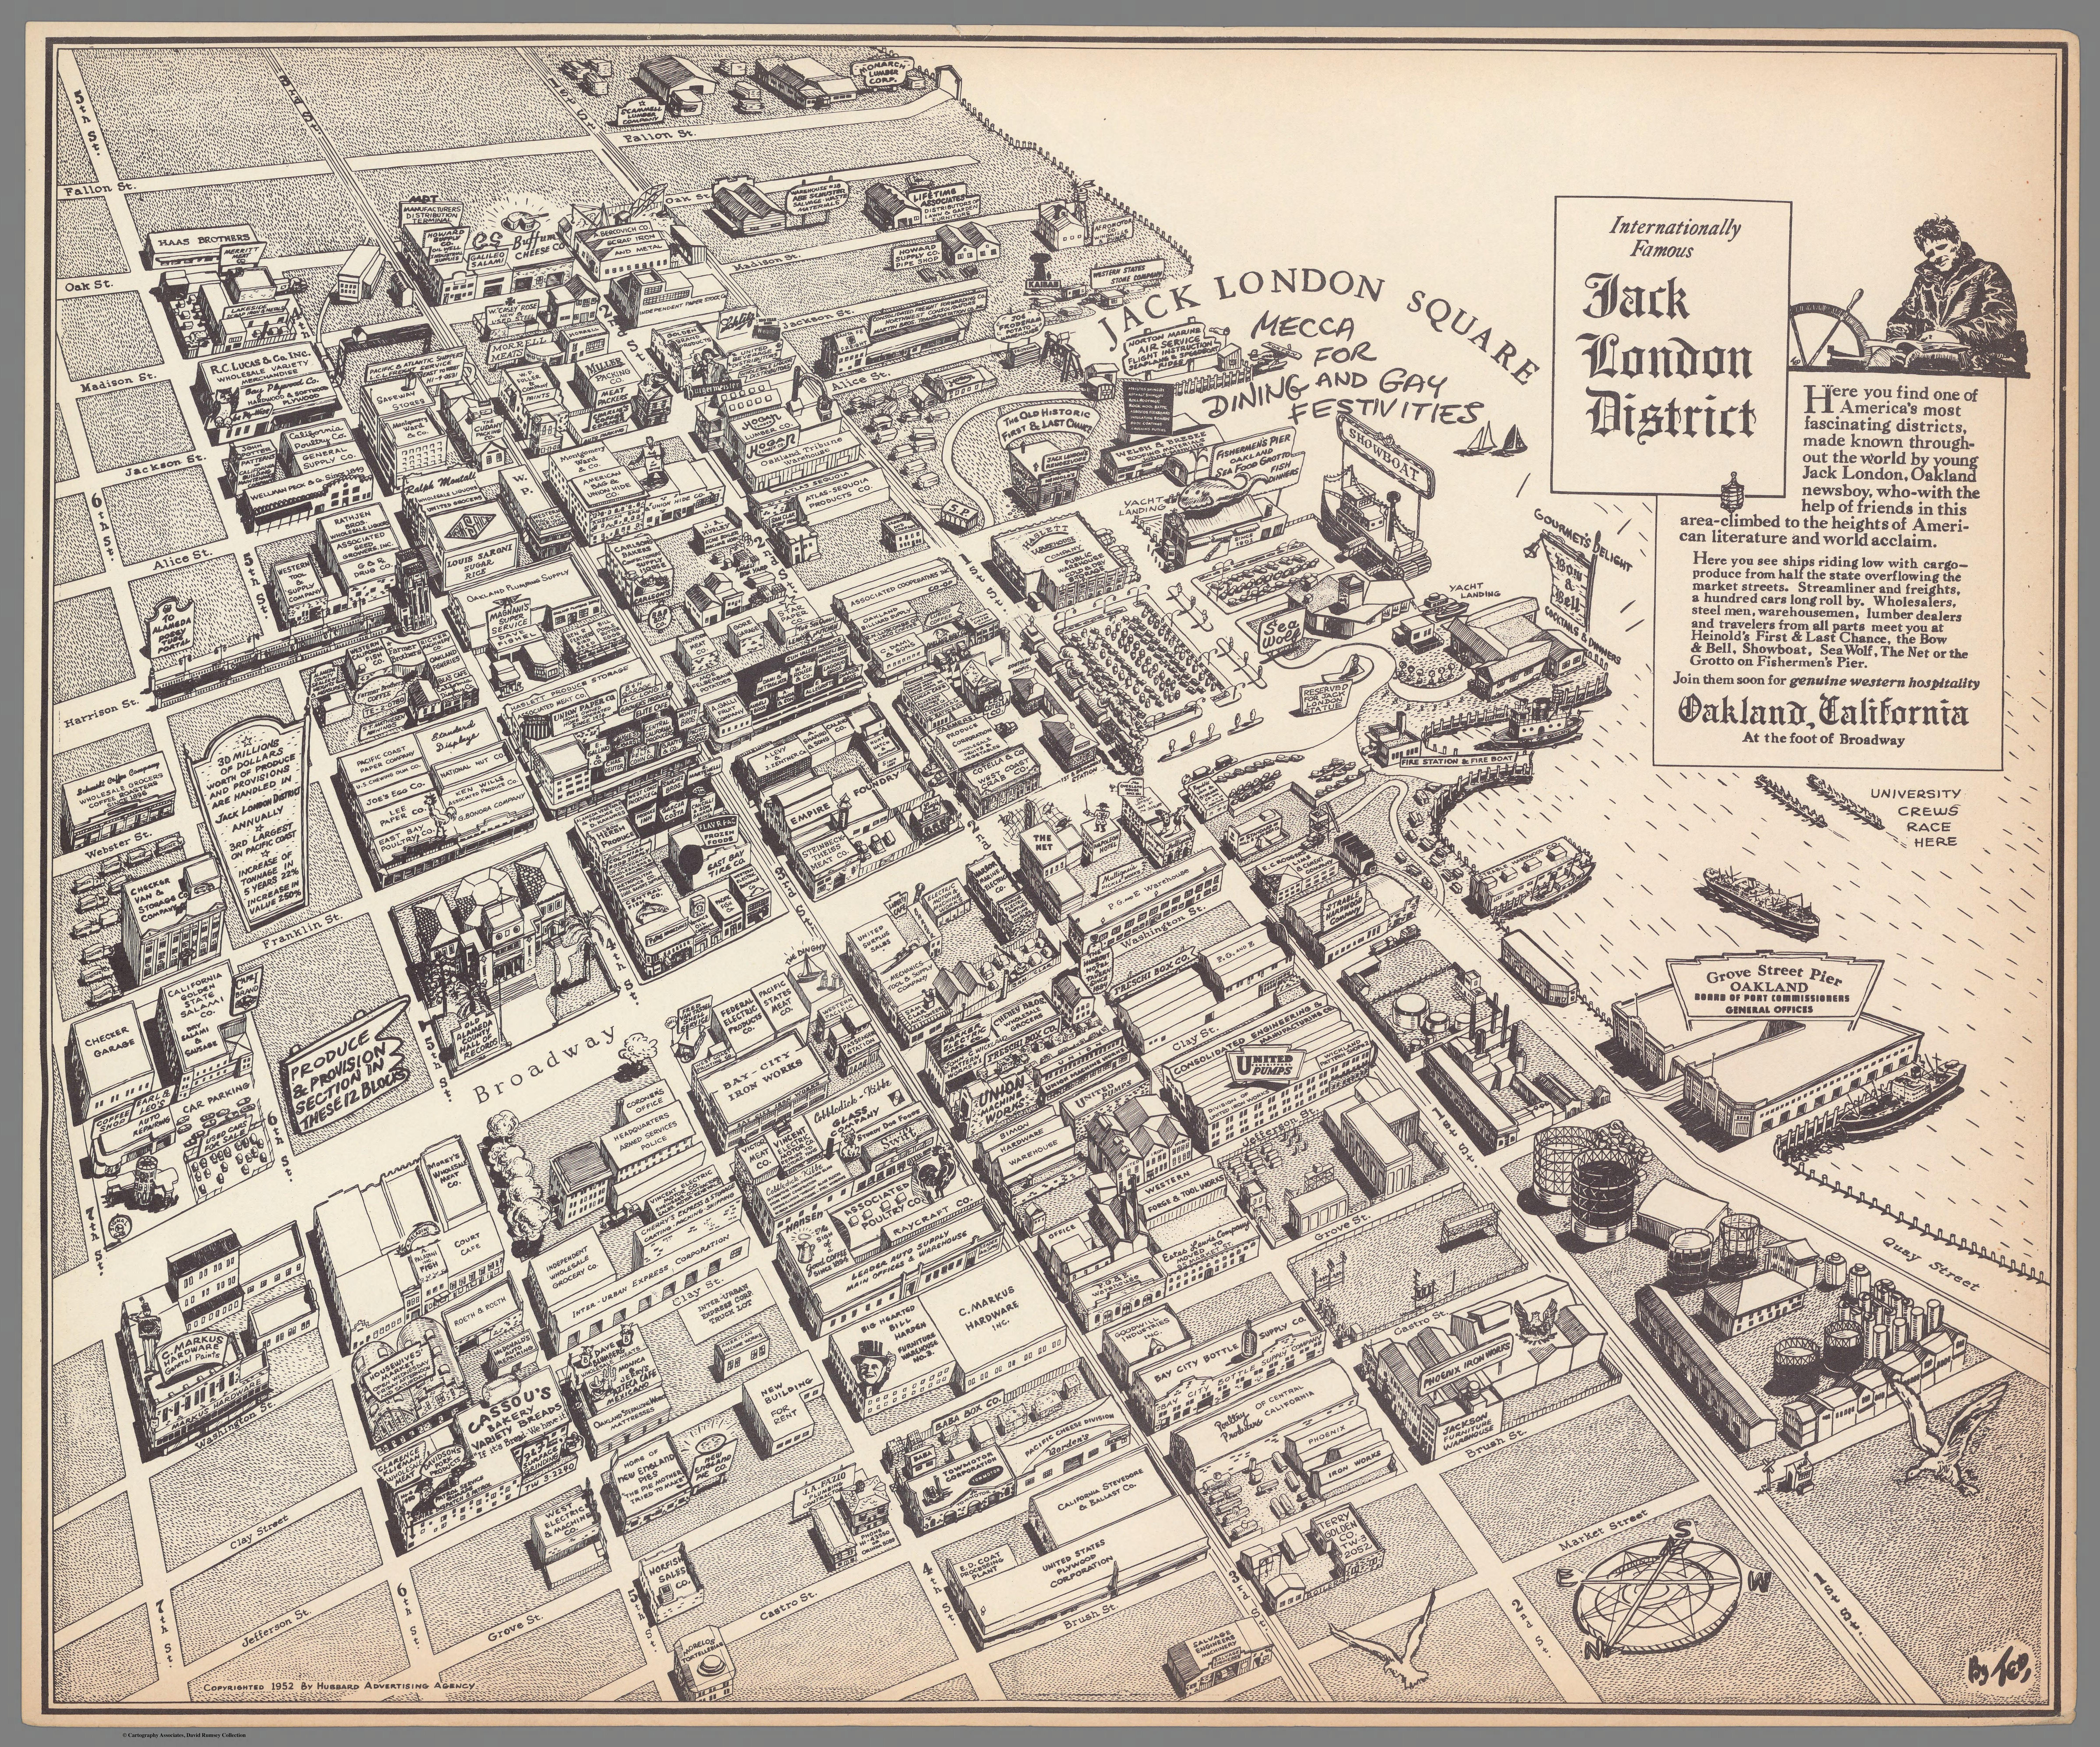 Internationally Famous Jack London District.jpg